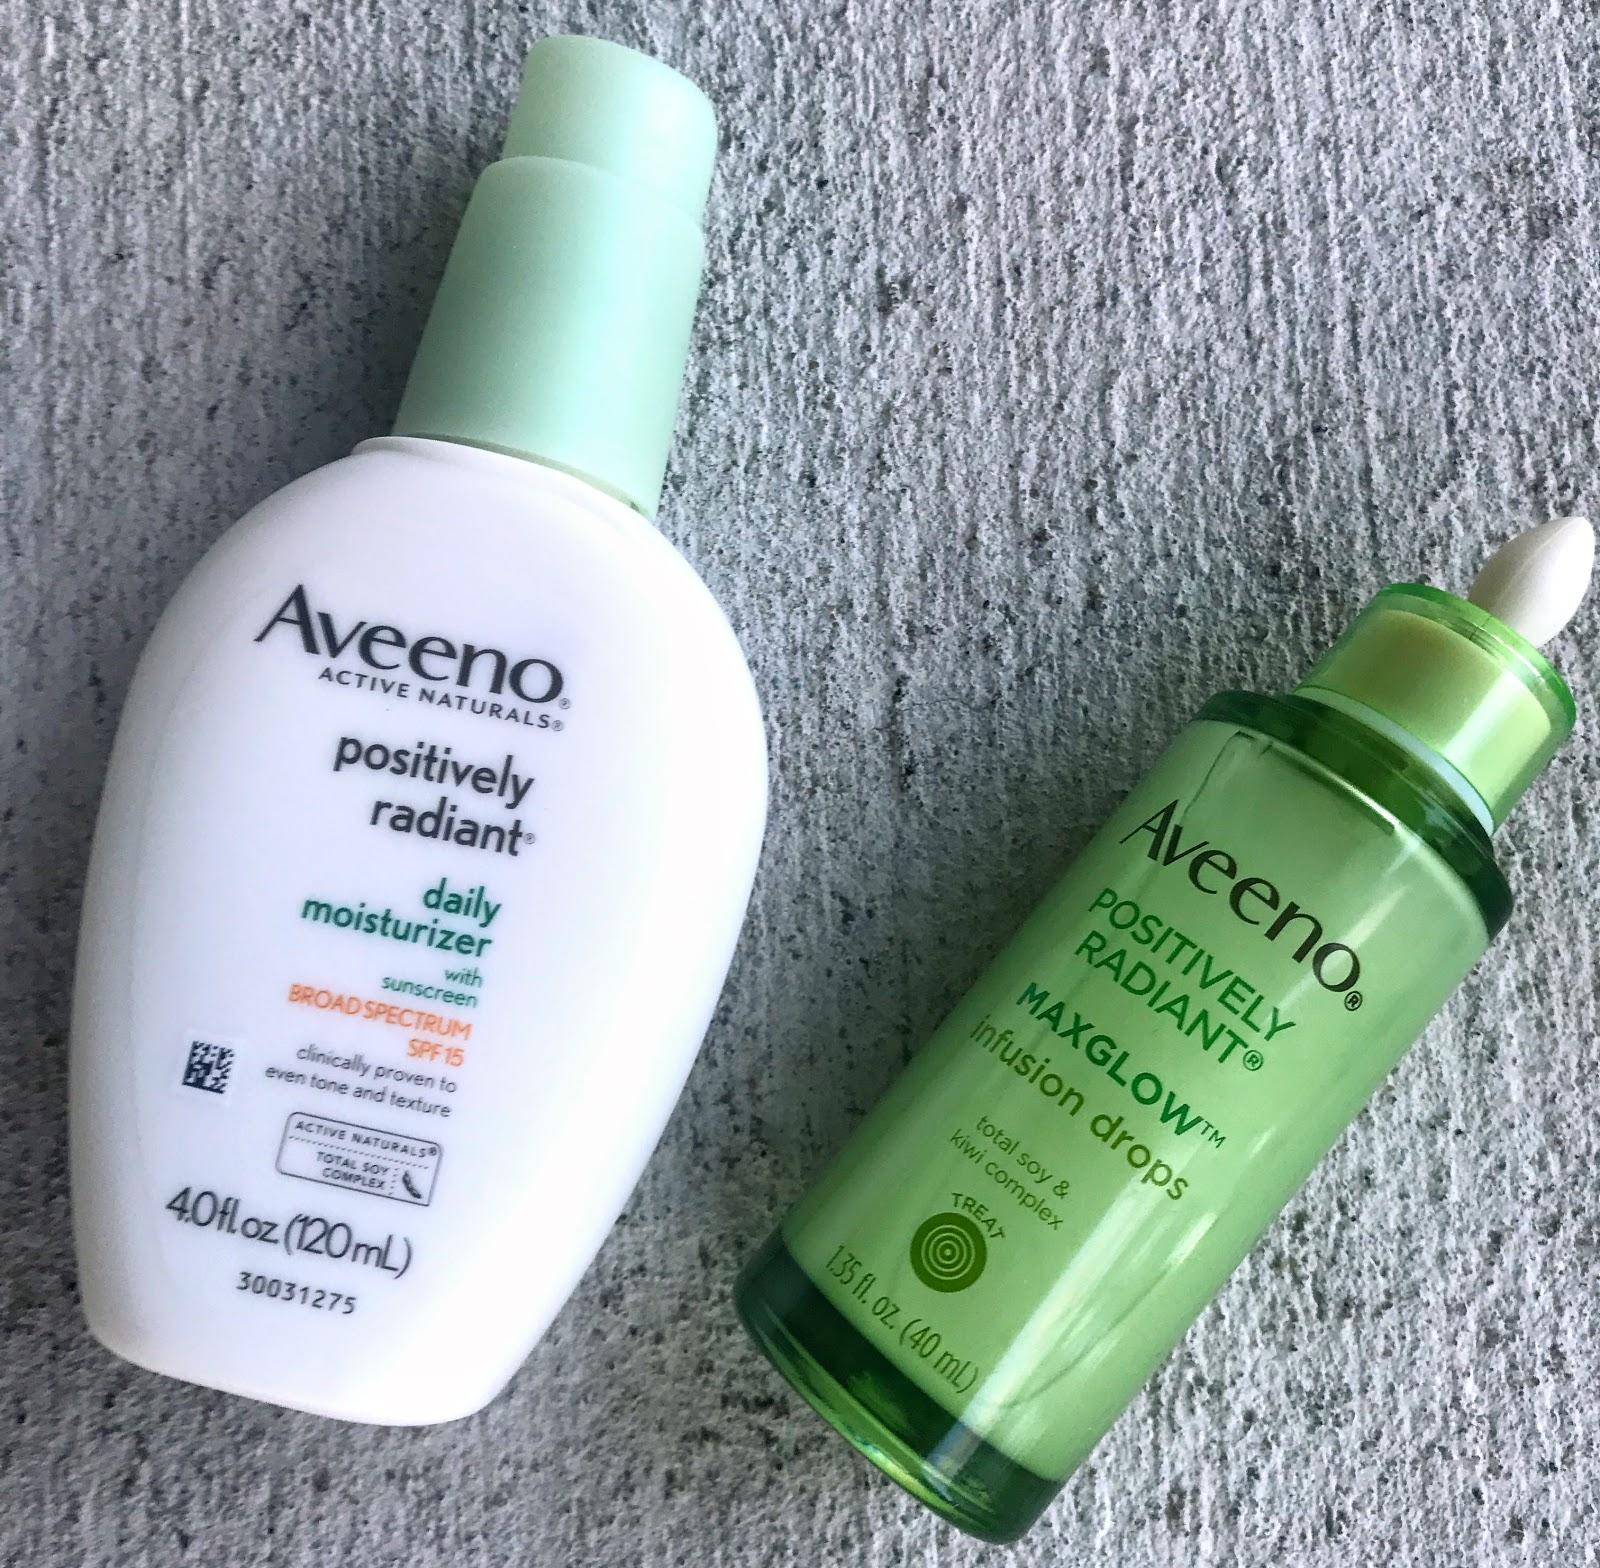 Image: Aveeno Positively Radiant moisturizer, Aveeno Glow drops